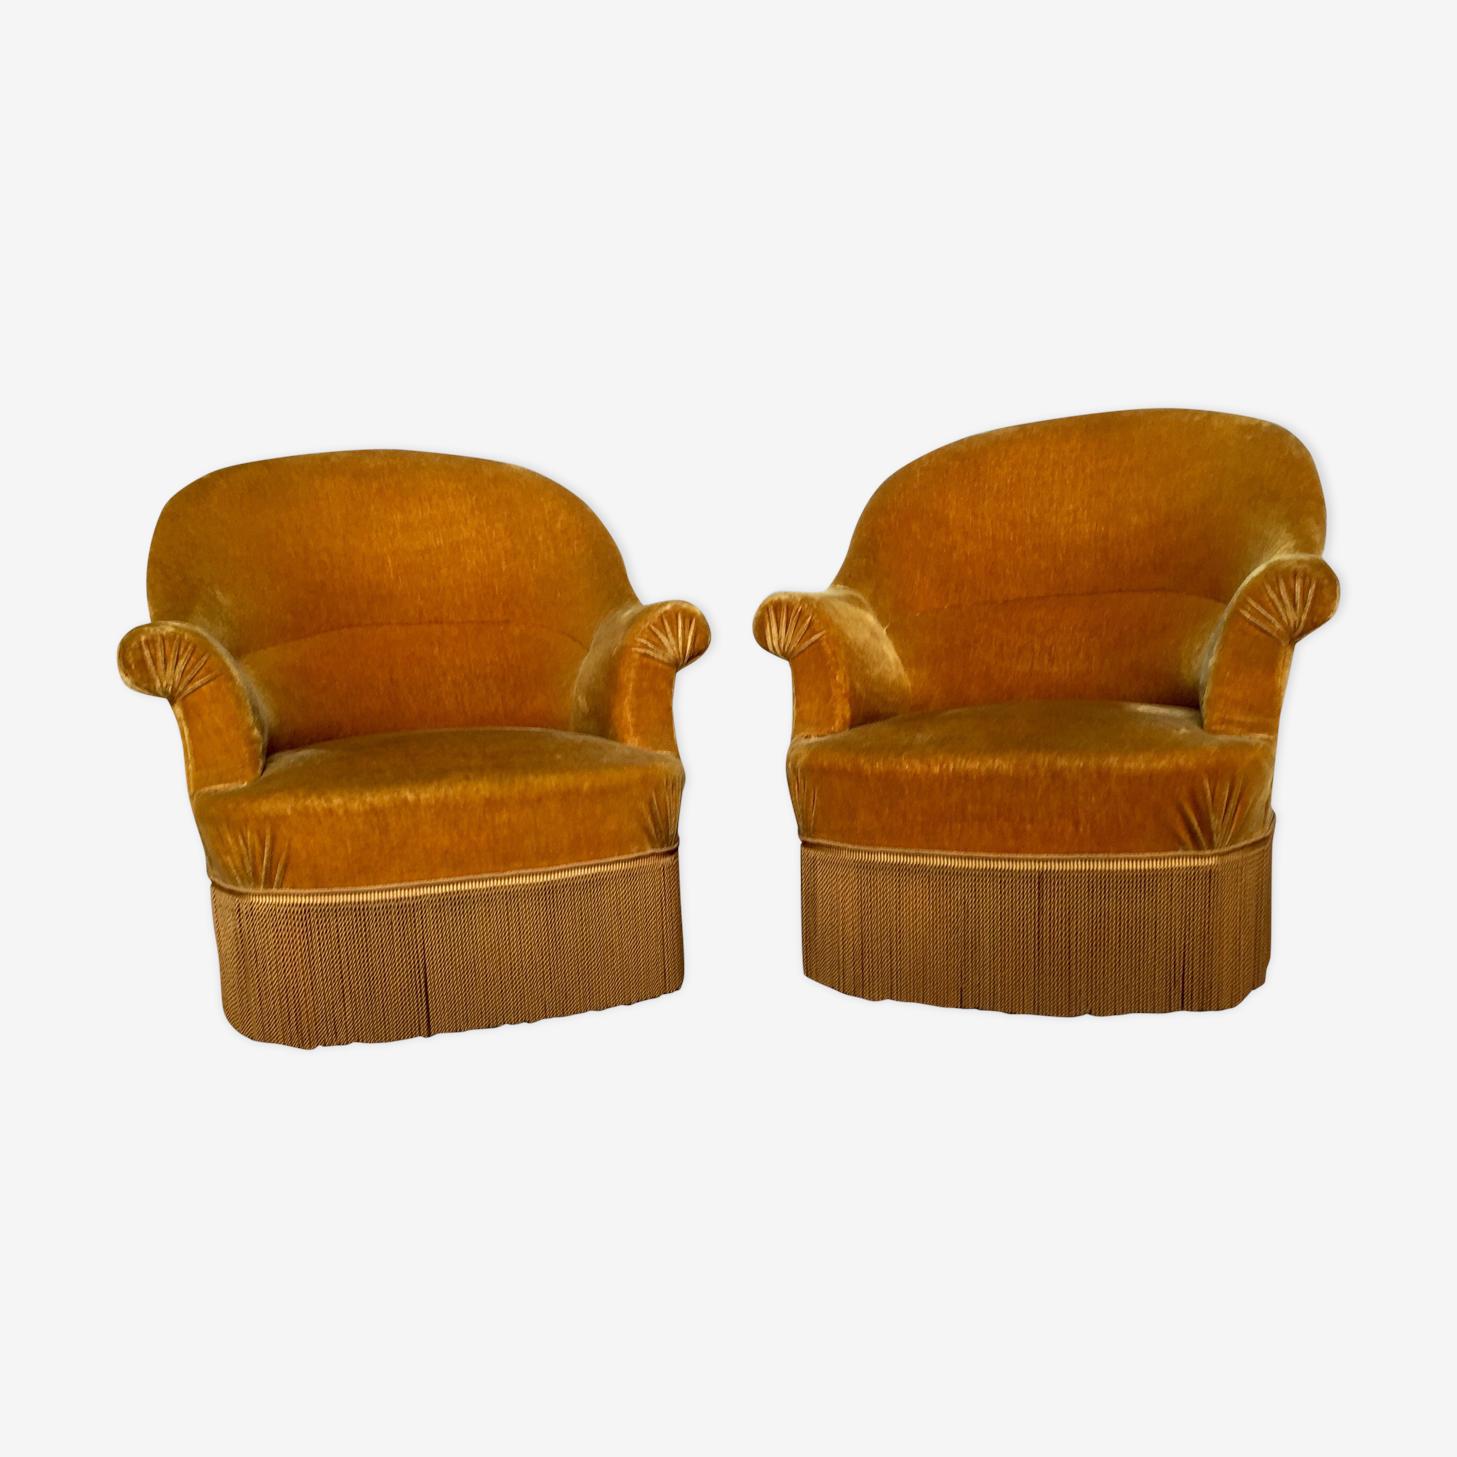 Paire de fauteuils crapaud jaune